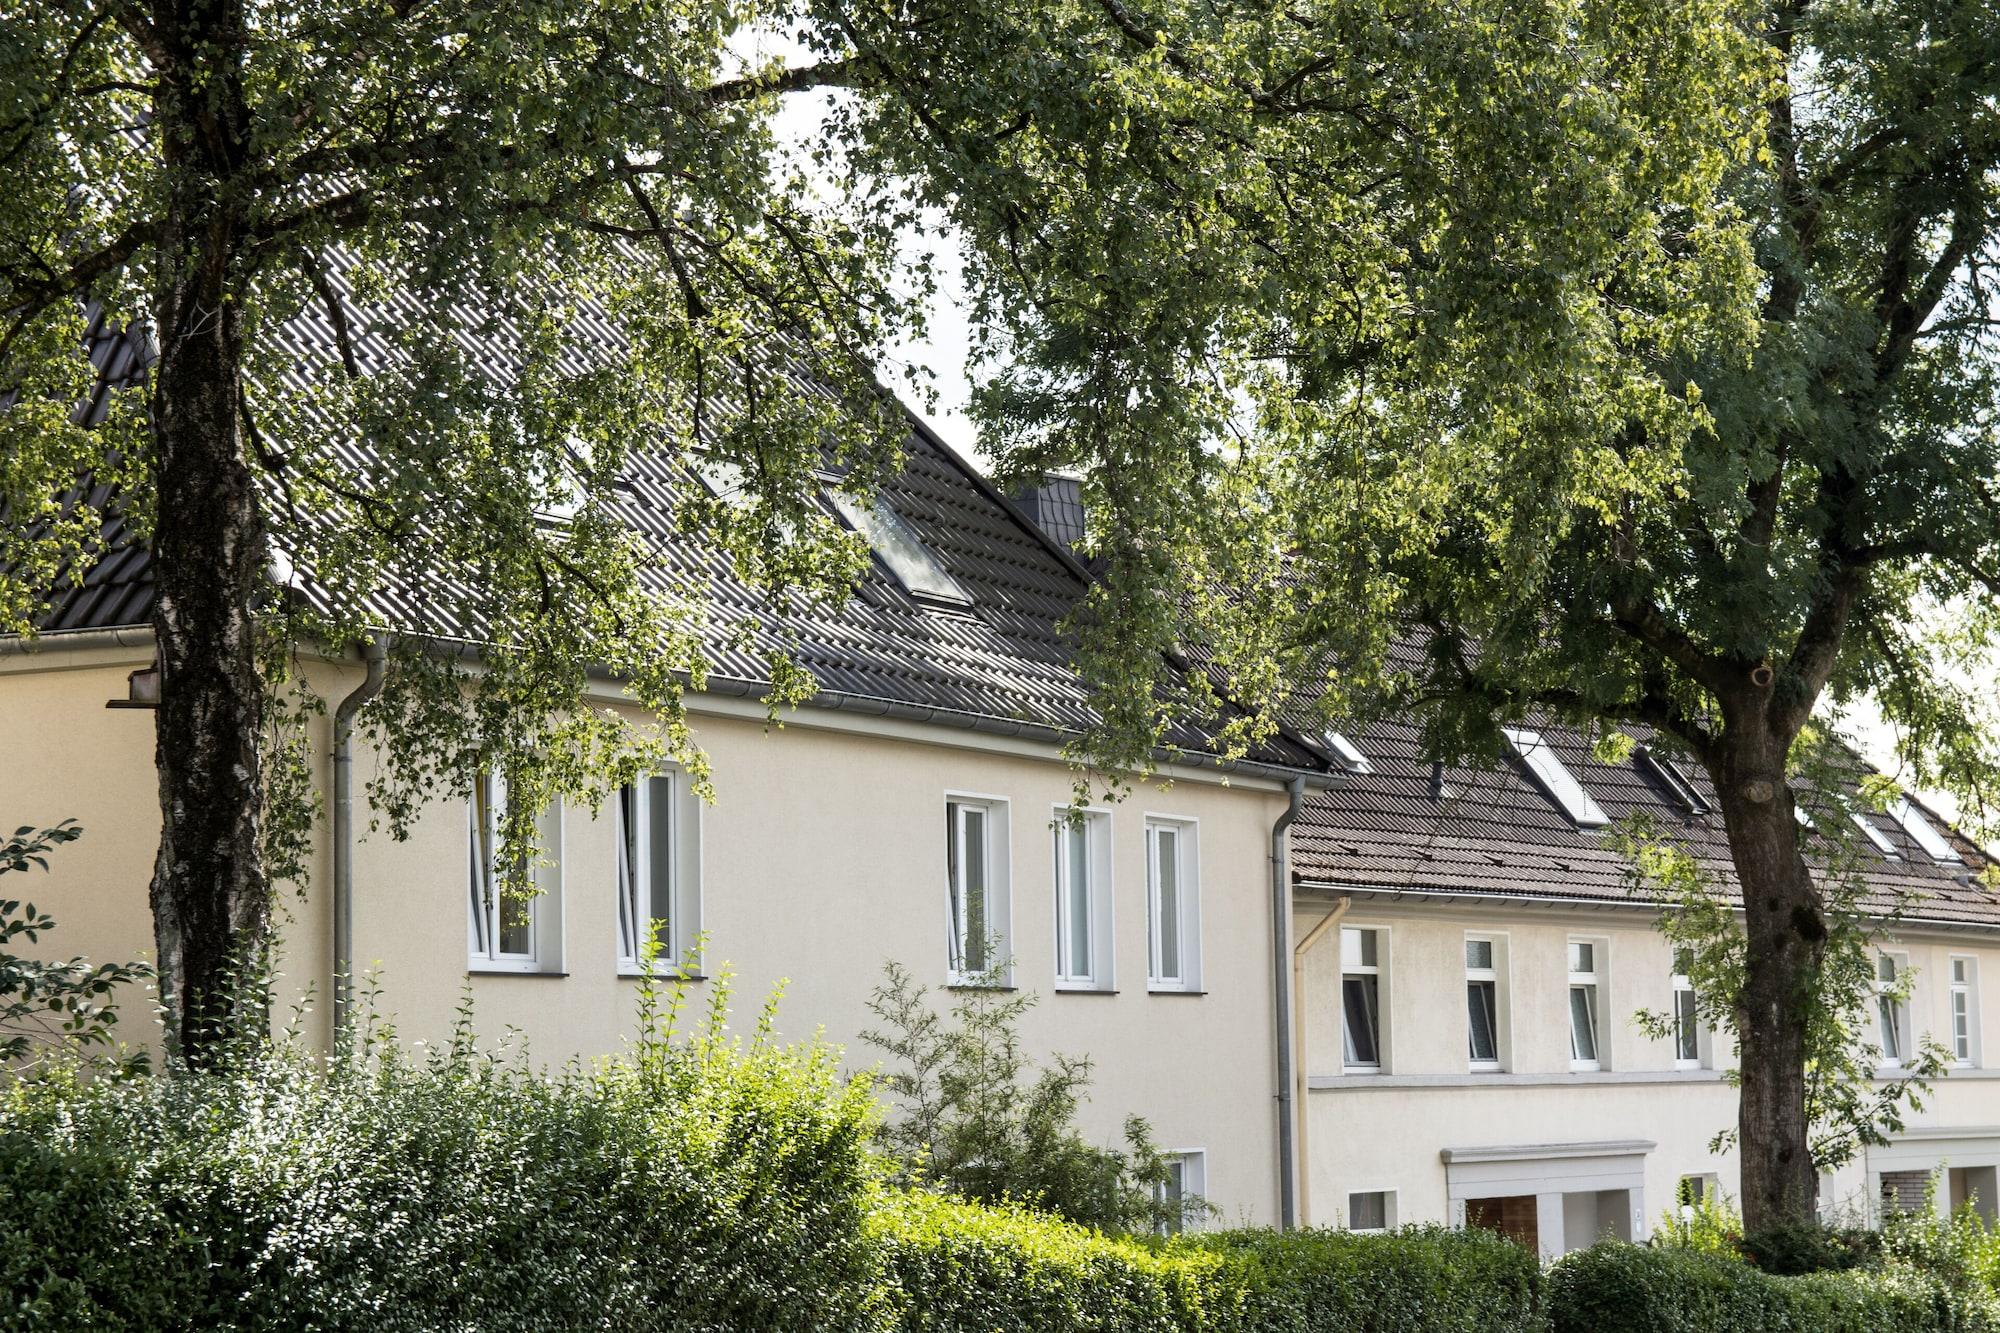 a-domo Apartments Mülheim - Serviced Apartments & Flats - short or longterm - single or grouptravel, Mülheim an der Ruhr